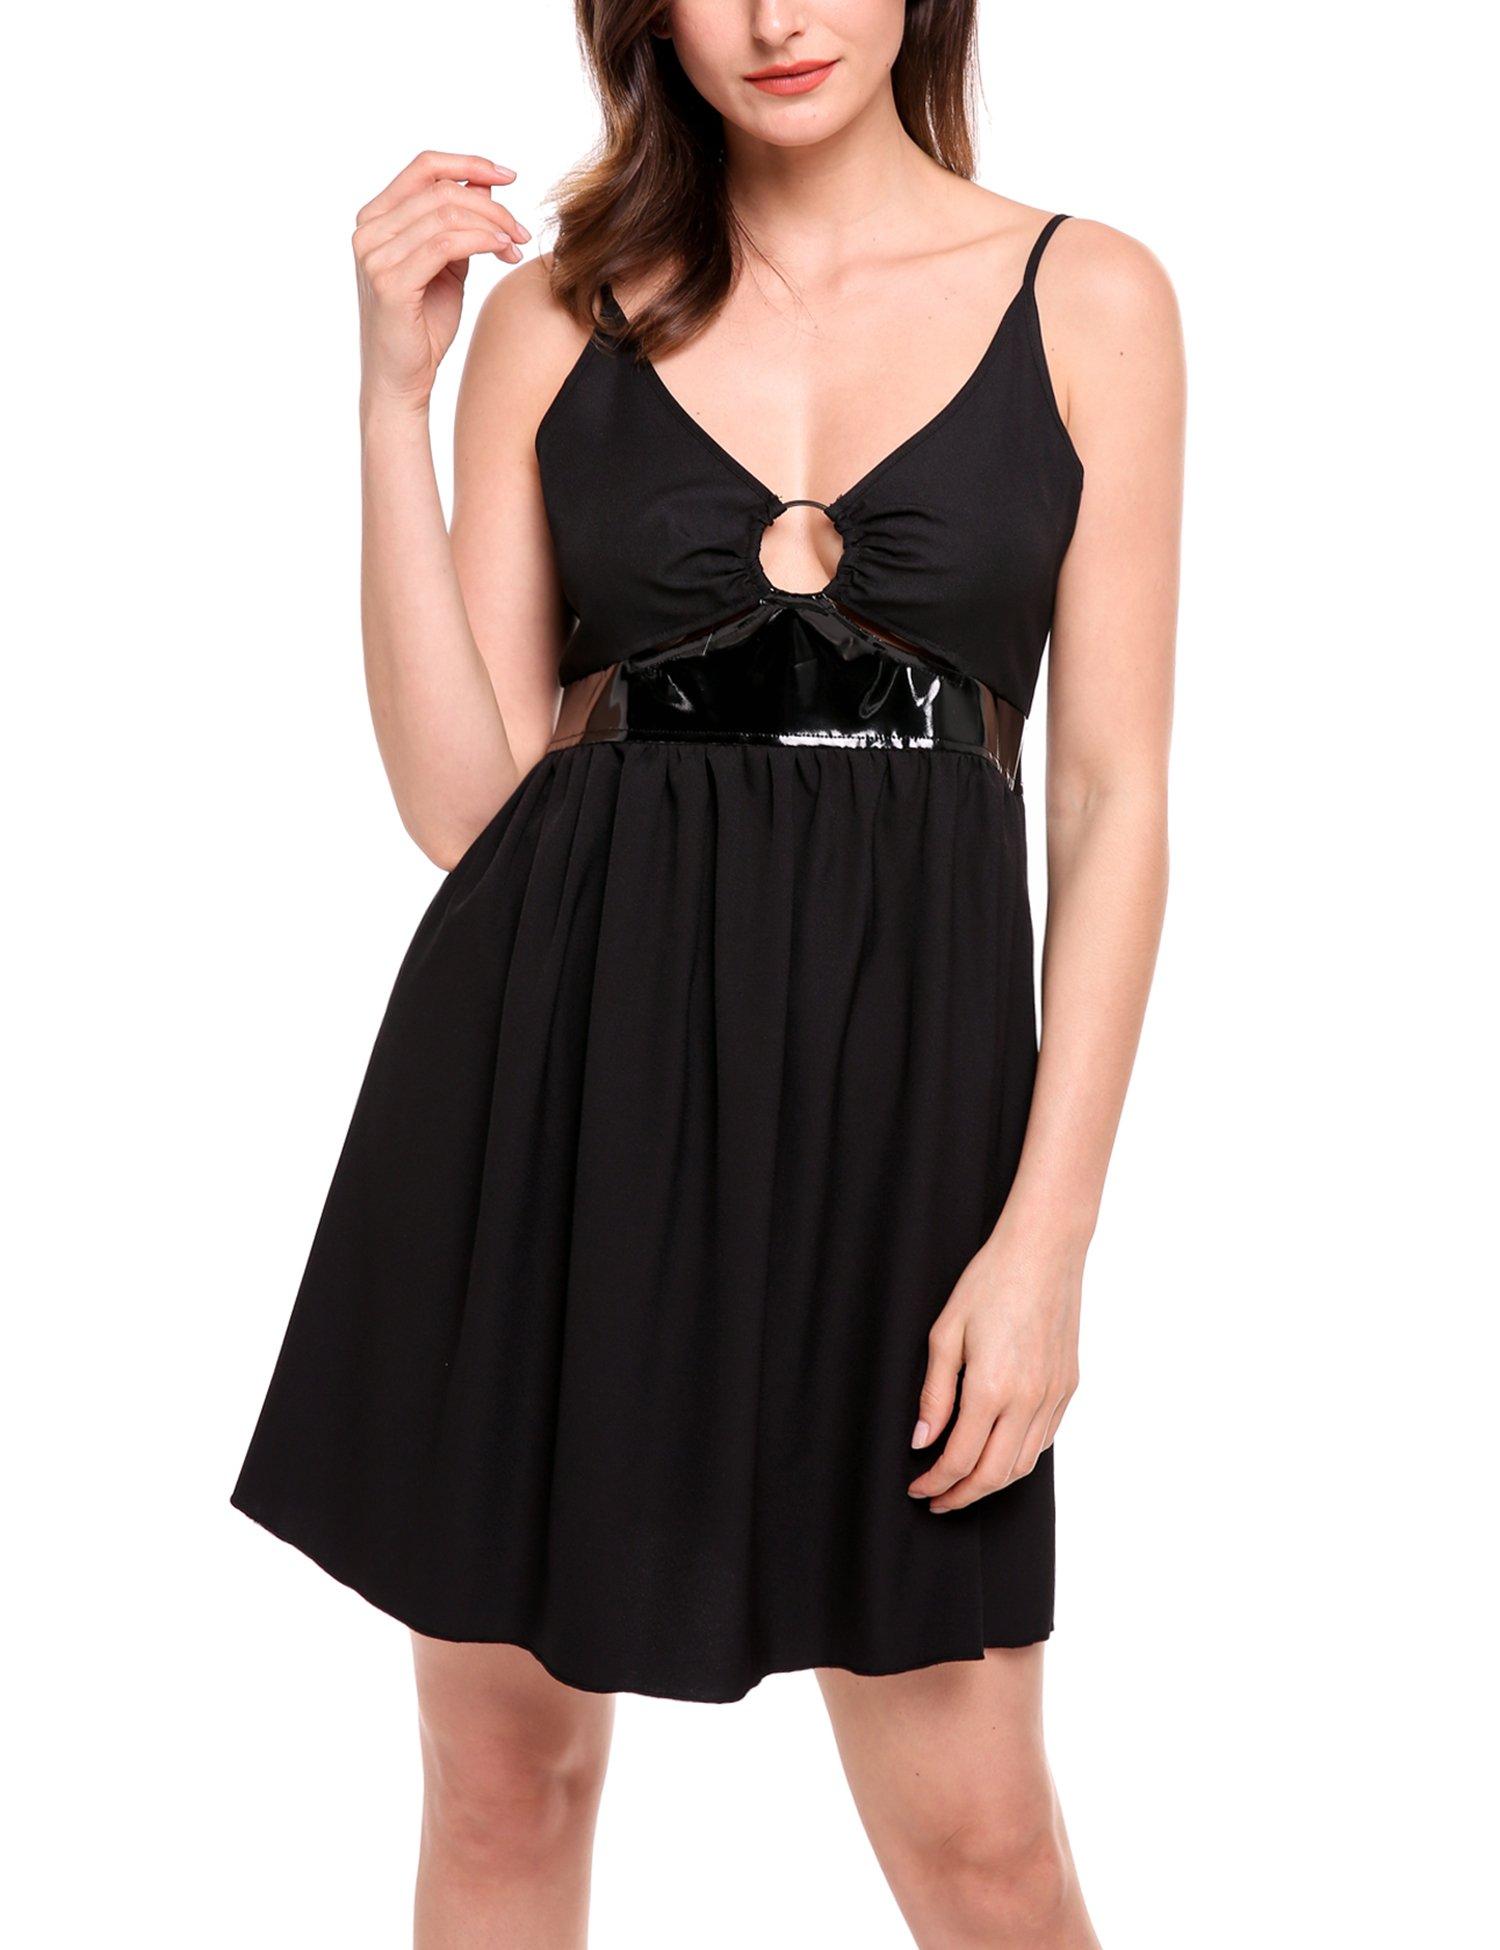 ANGVNS Women's Sexy Deep V Neck Bodycon Club Night Party Mini Dress(Black,XL)